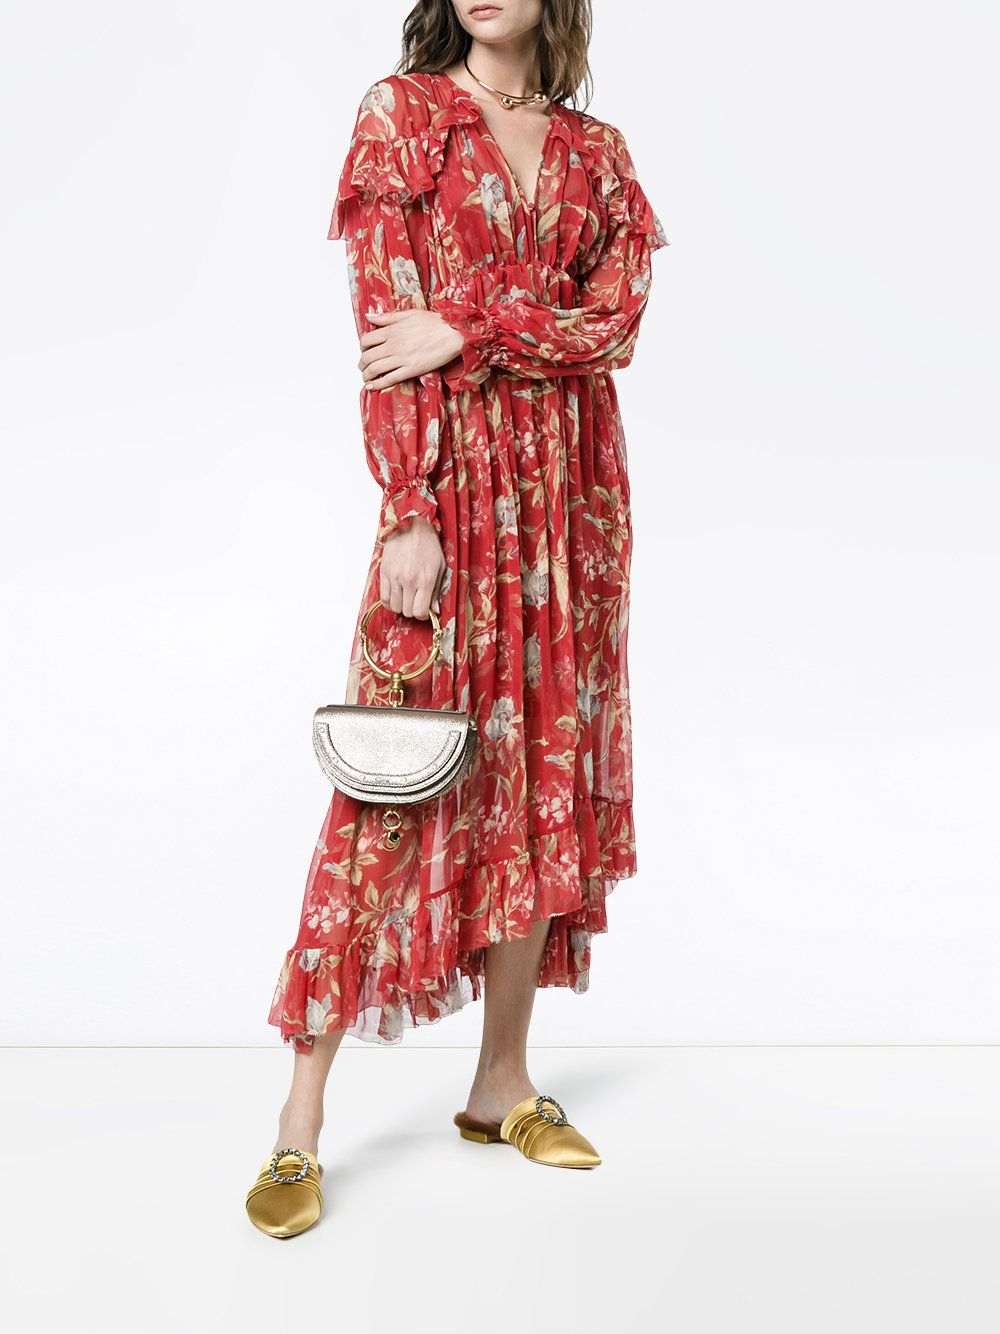 Frauen Tiefe V Ausschnitt Rüschen Roter Seide Corsair Iris Cape Kleid